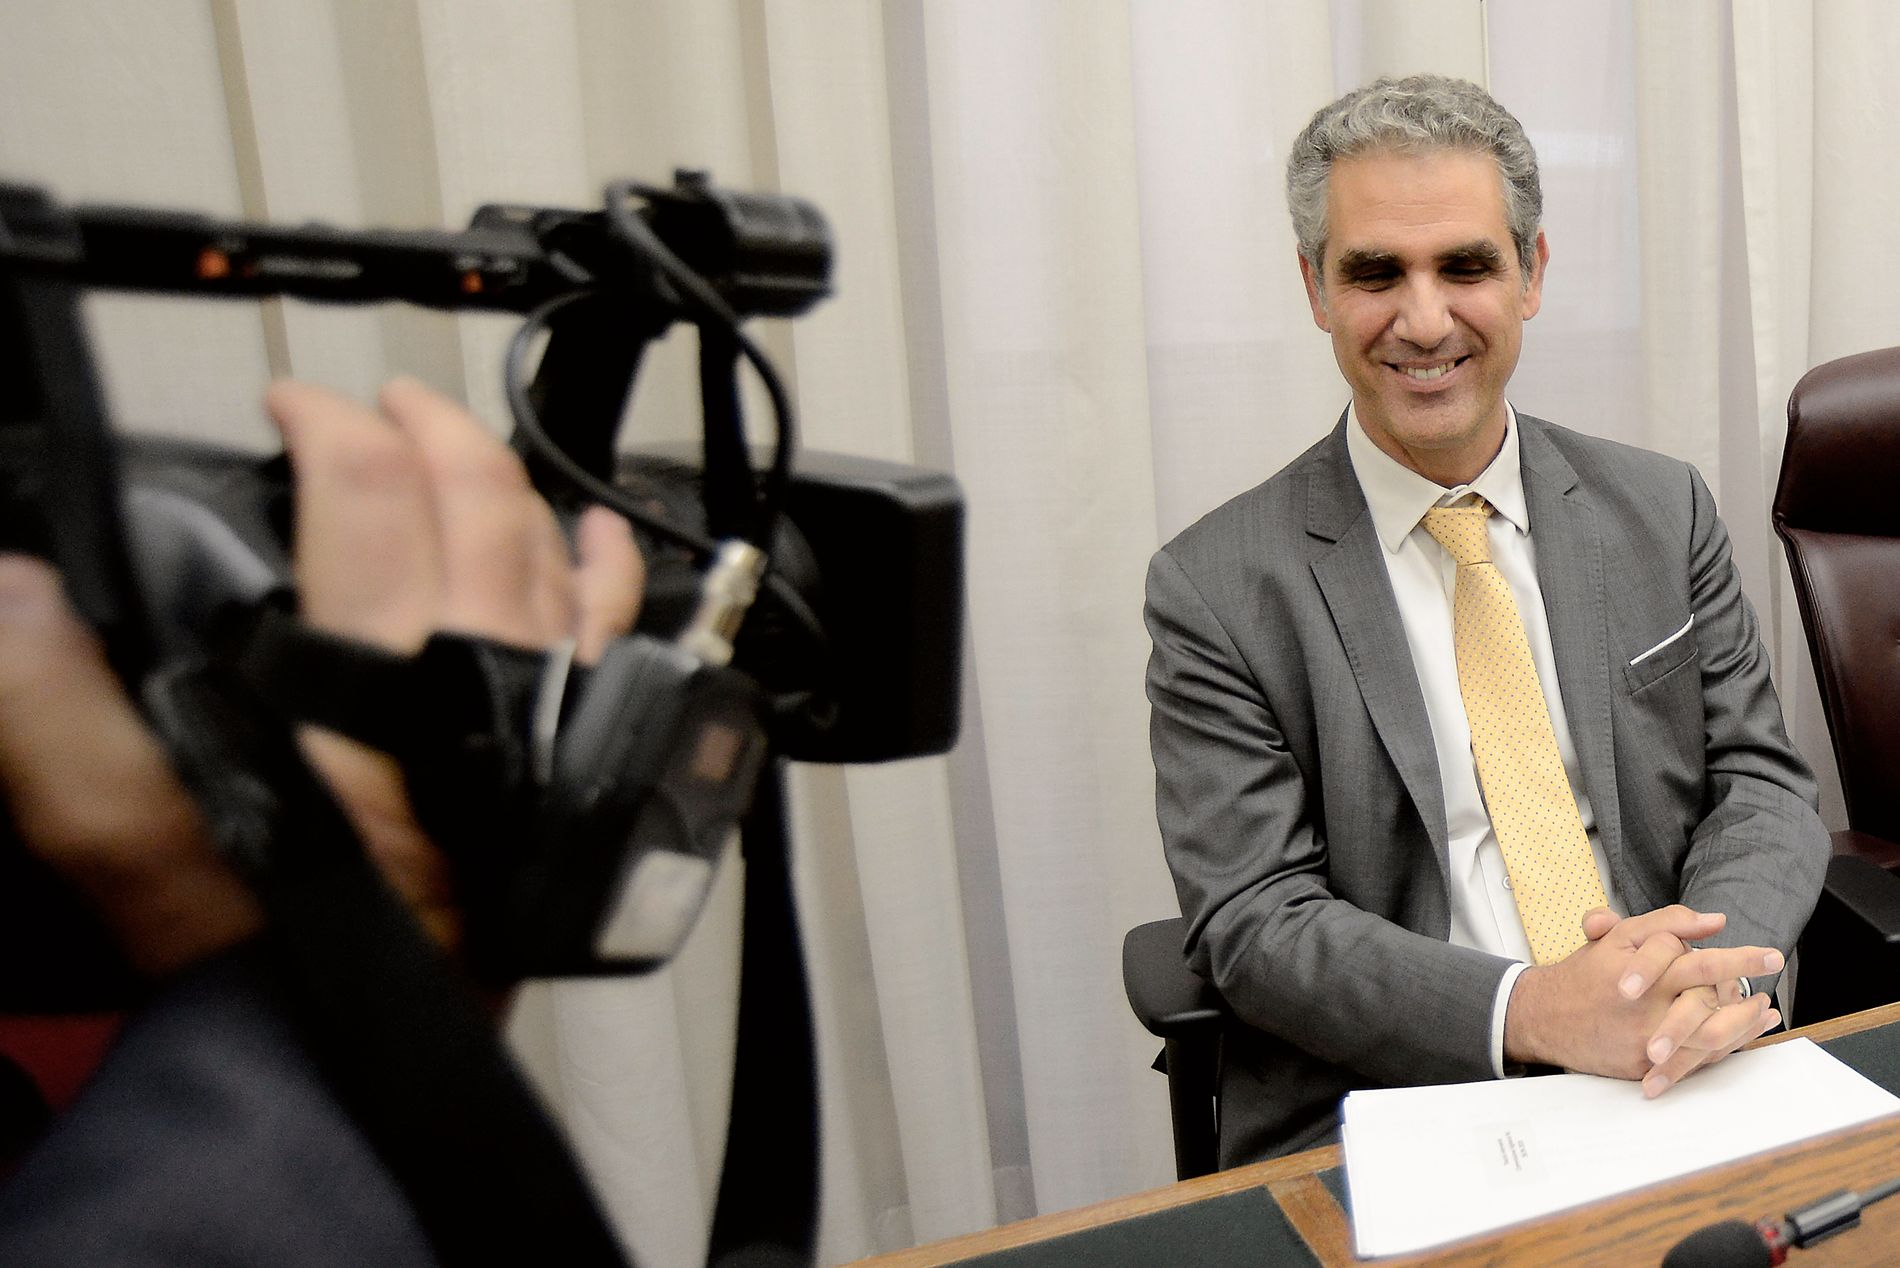 EKTE: Marcello Foa, ny sjef for RAI